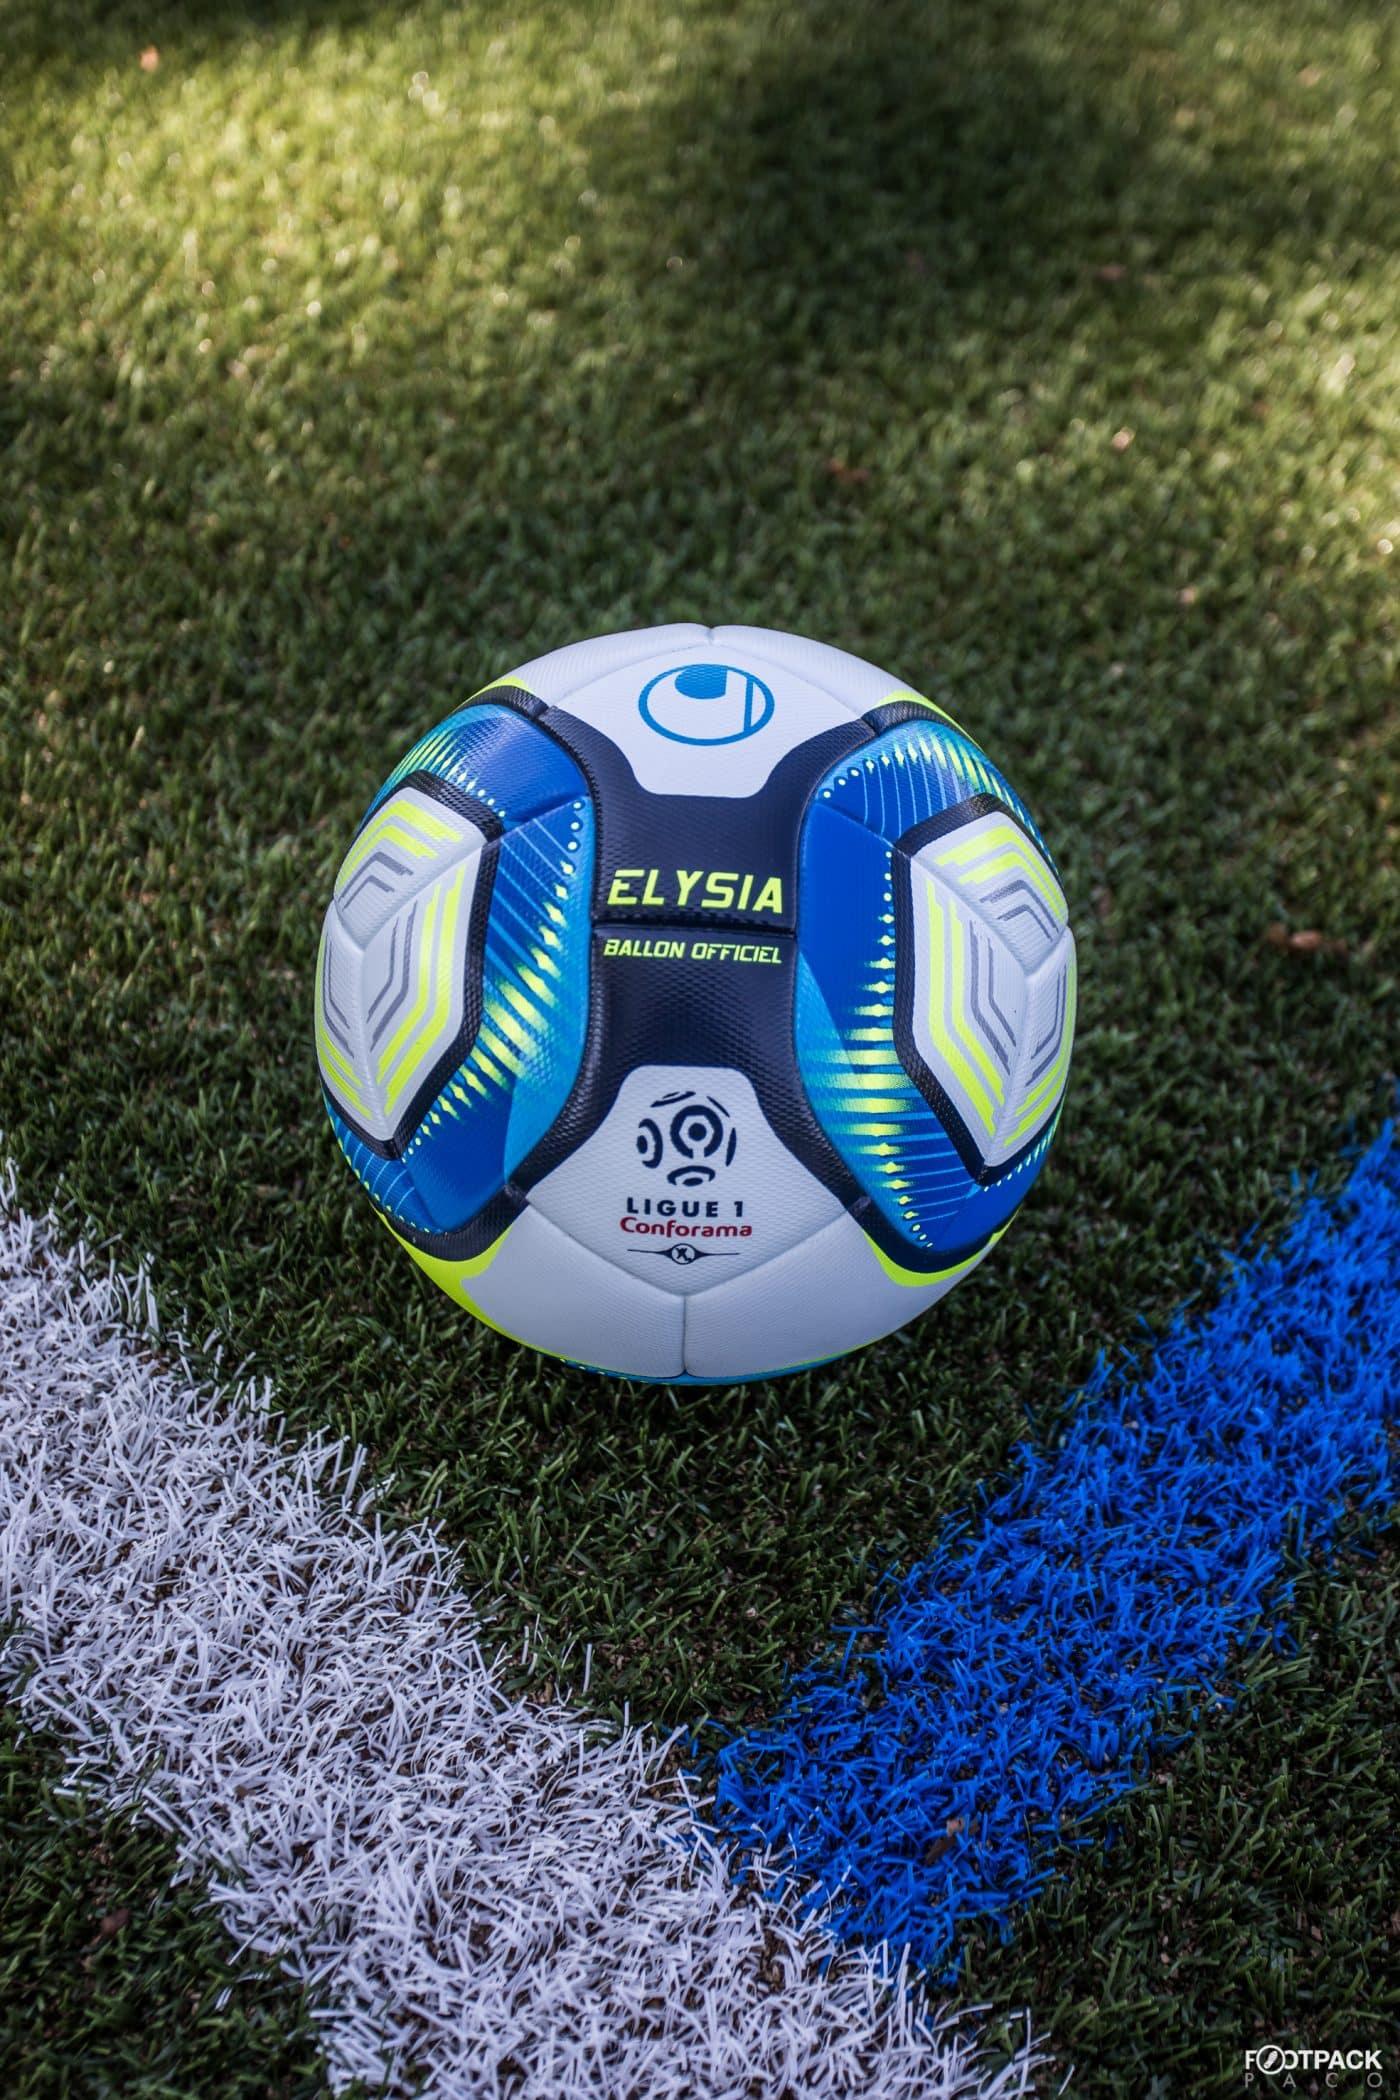 ballon-ulhsport-elysia-ligue-1-2019-2020-footpack-2